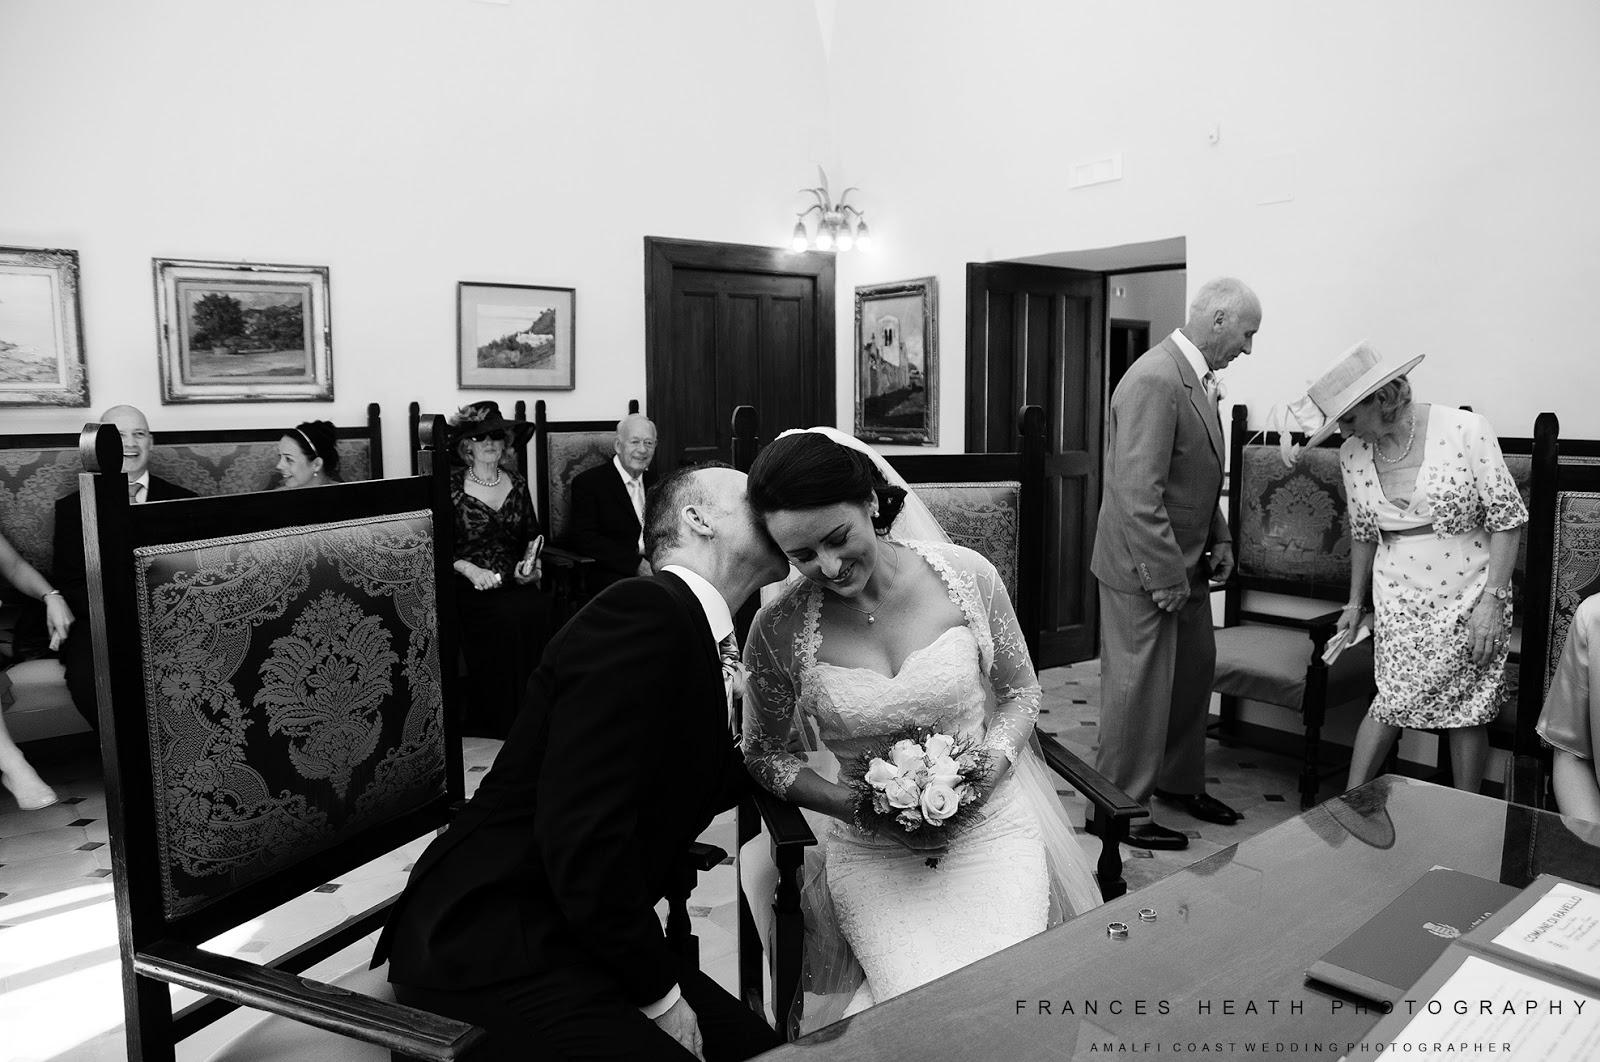 Wedding ceremony in Ravello town hall